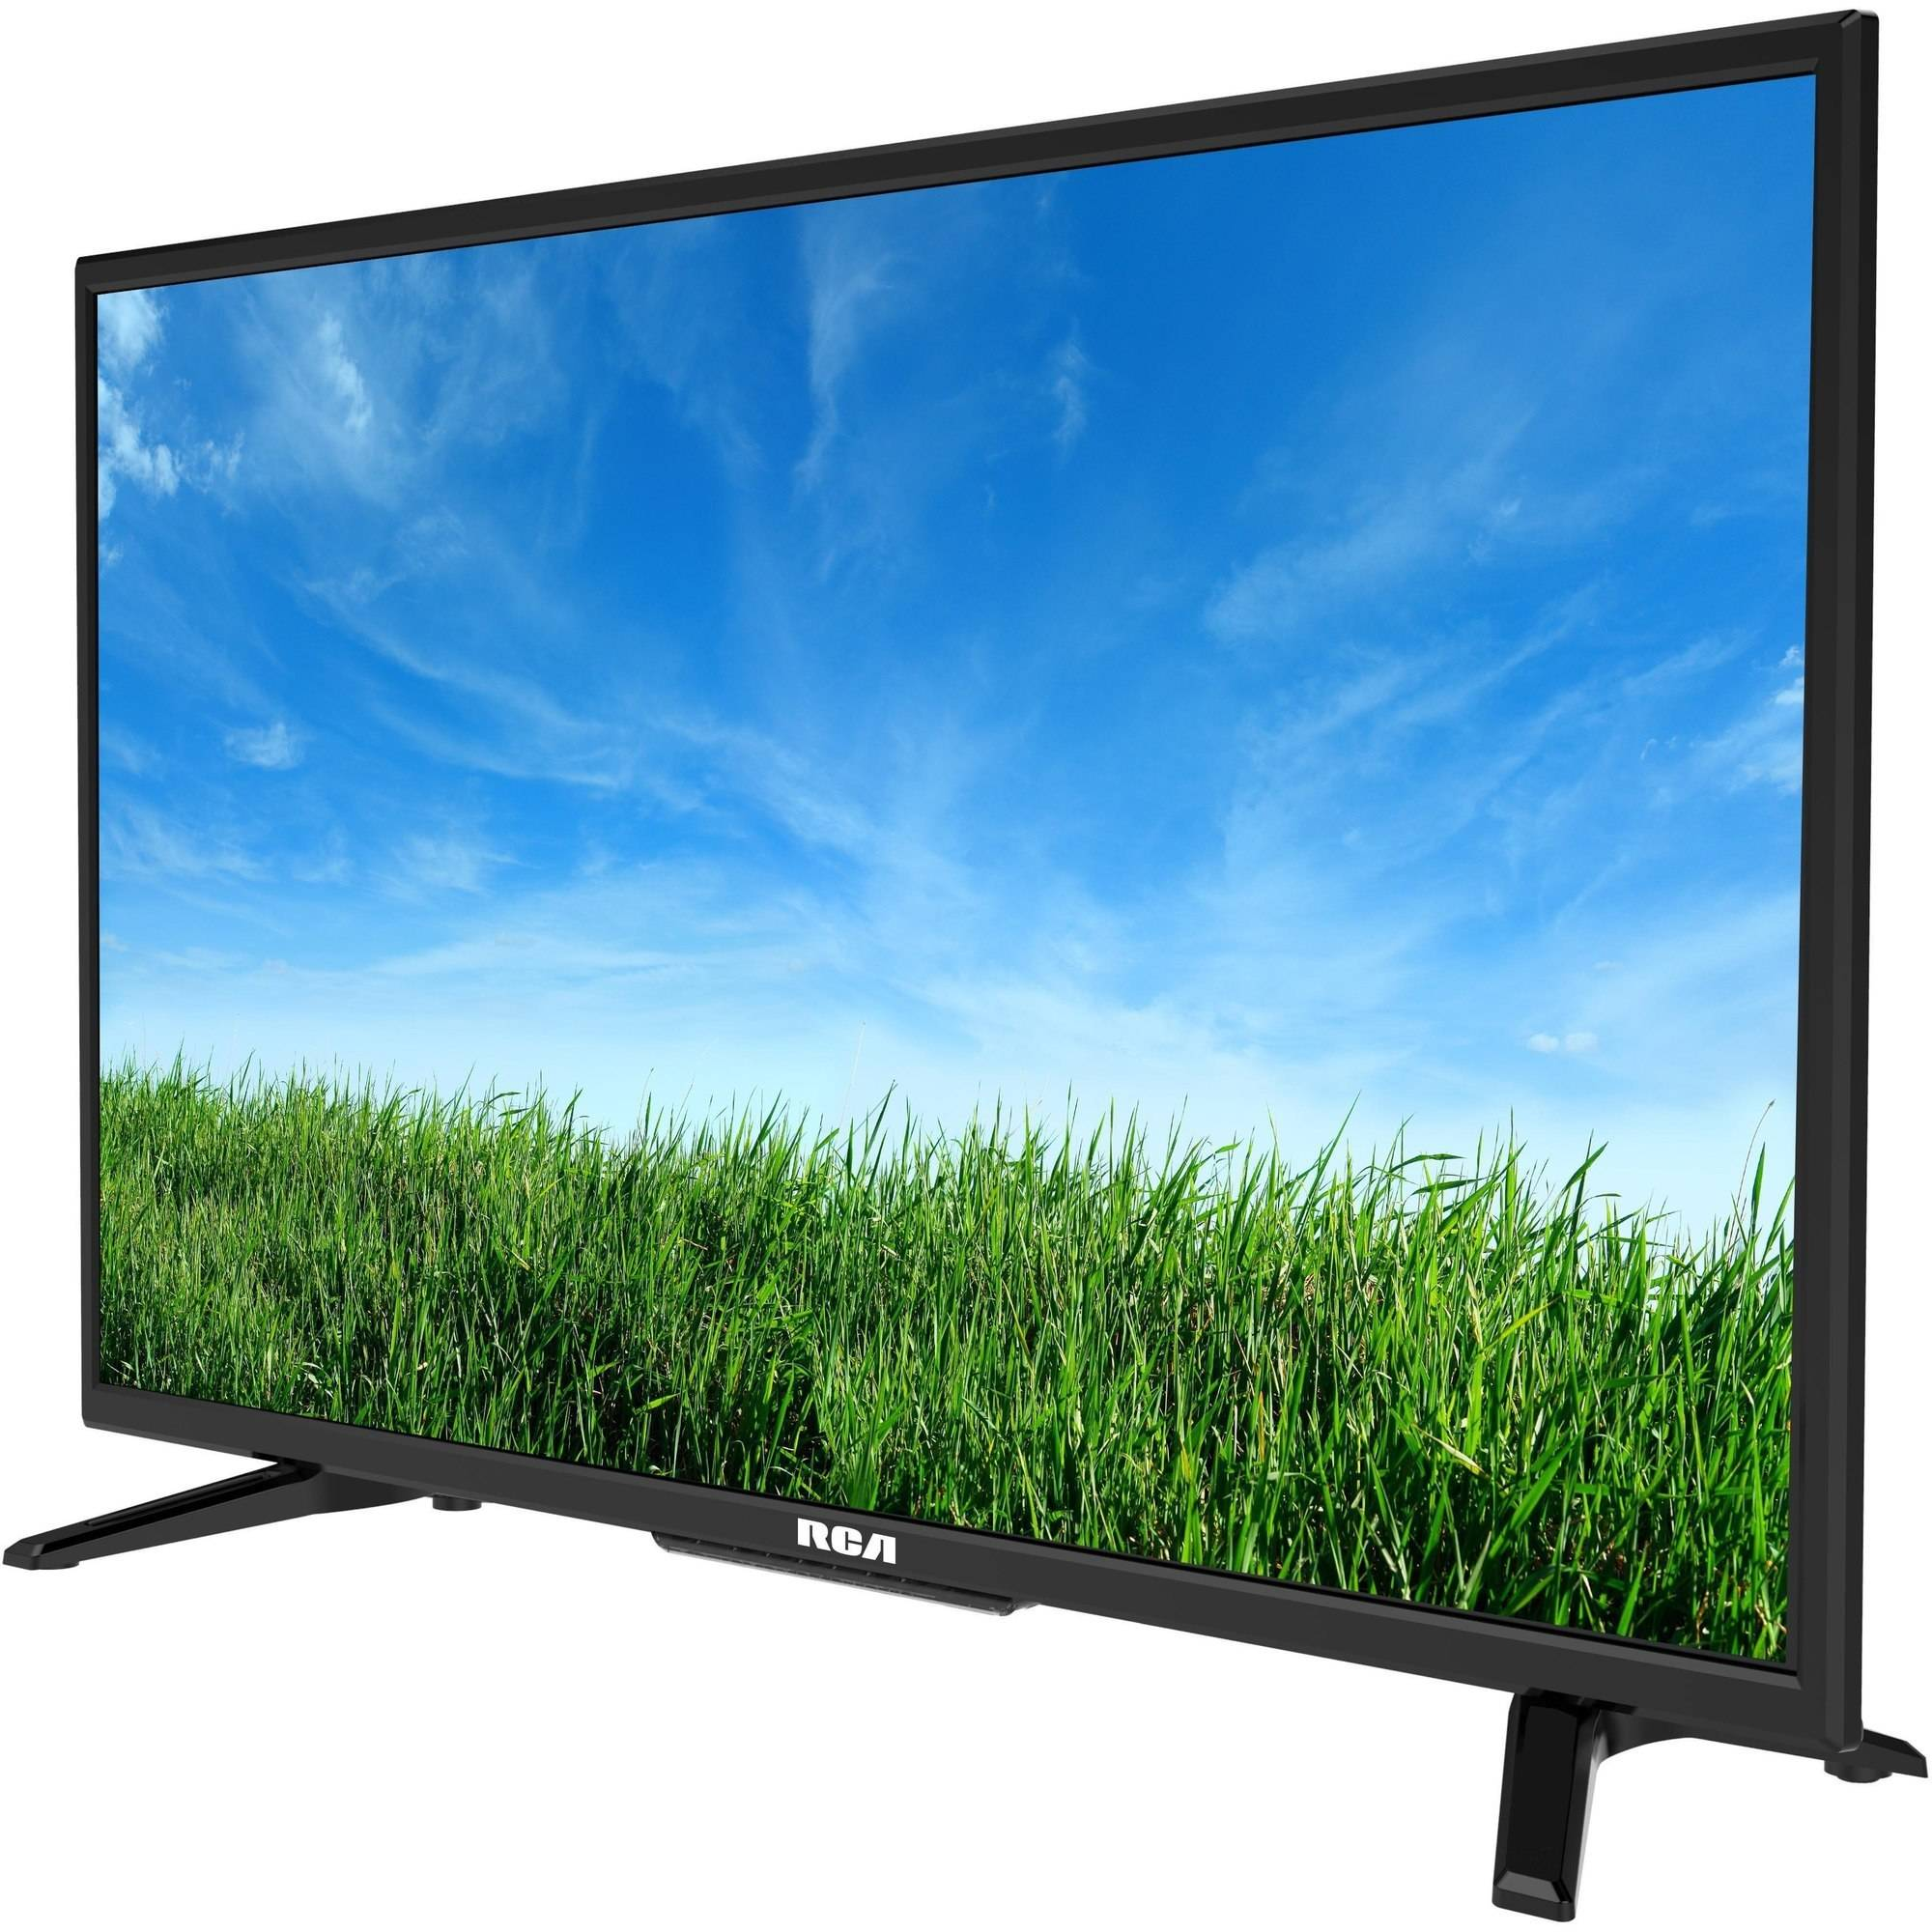 rca 32 class hd 720p led tv rldedv3255 a with built in dvd rh walmart com Sony DVD Player Pink Portable DVD Player